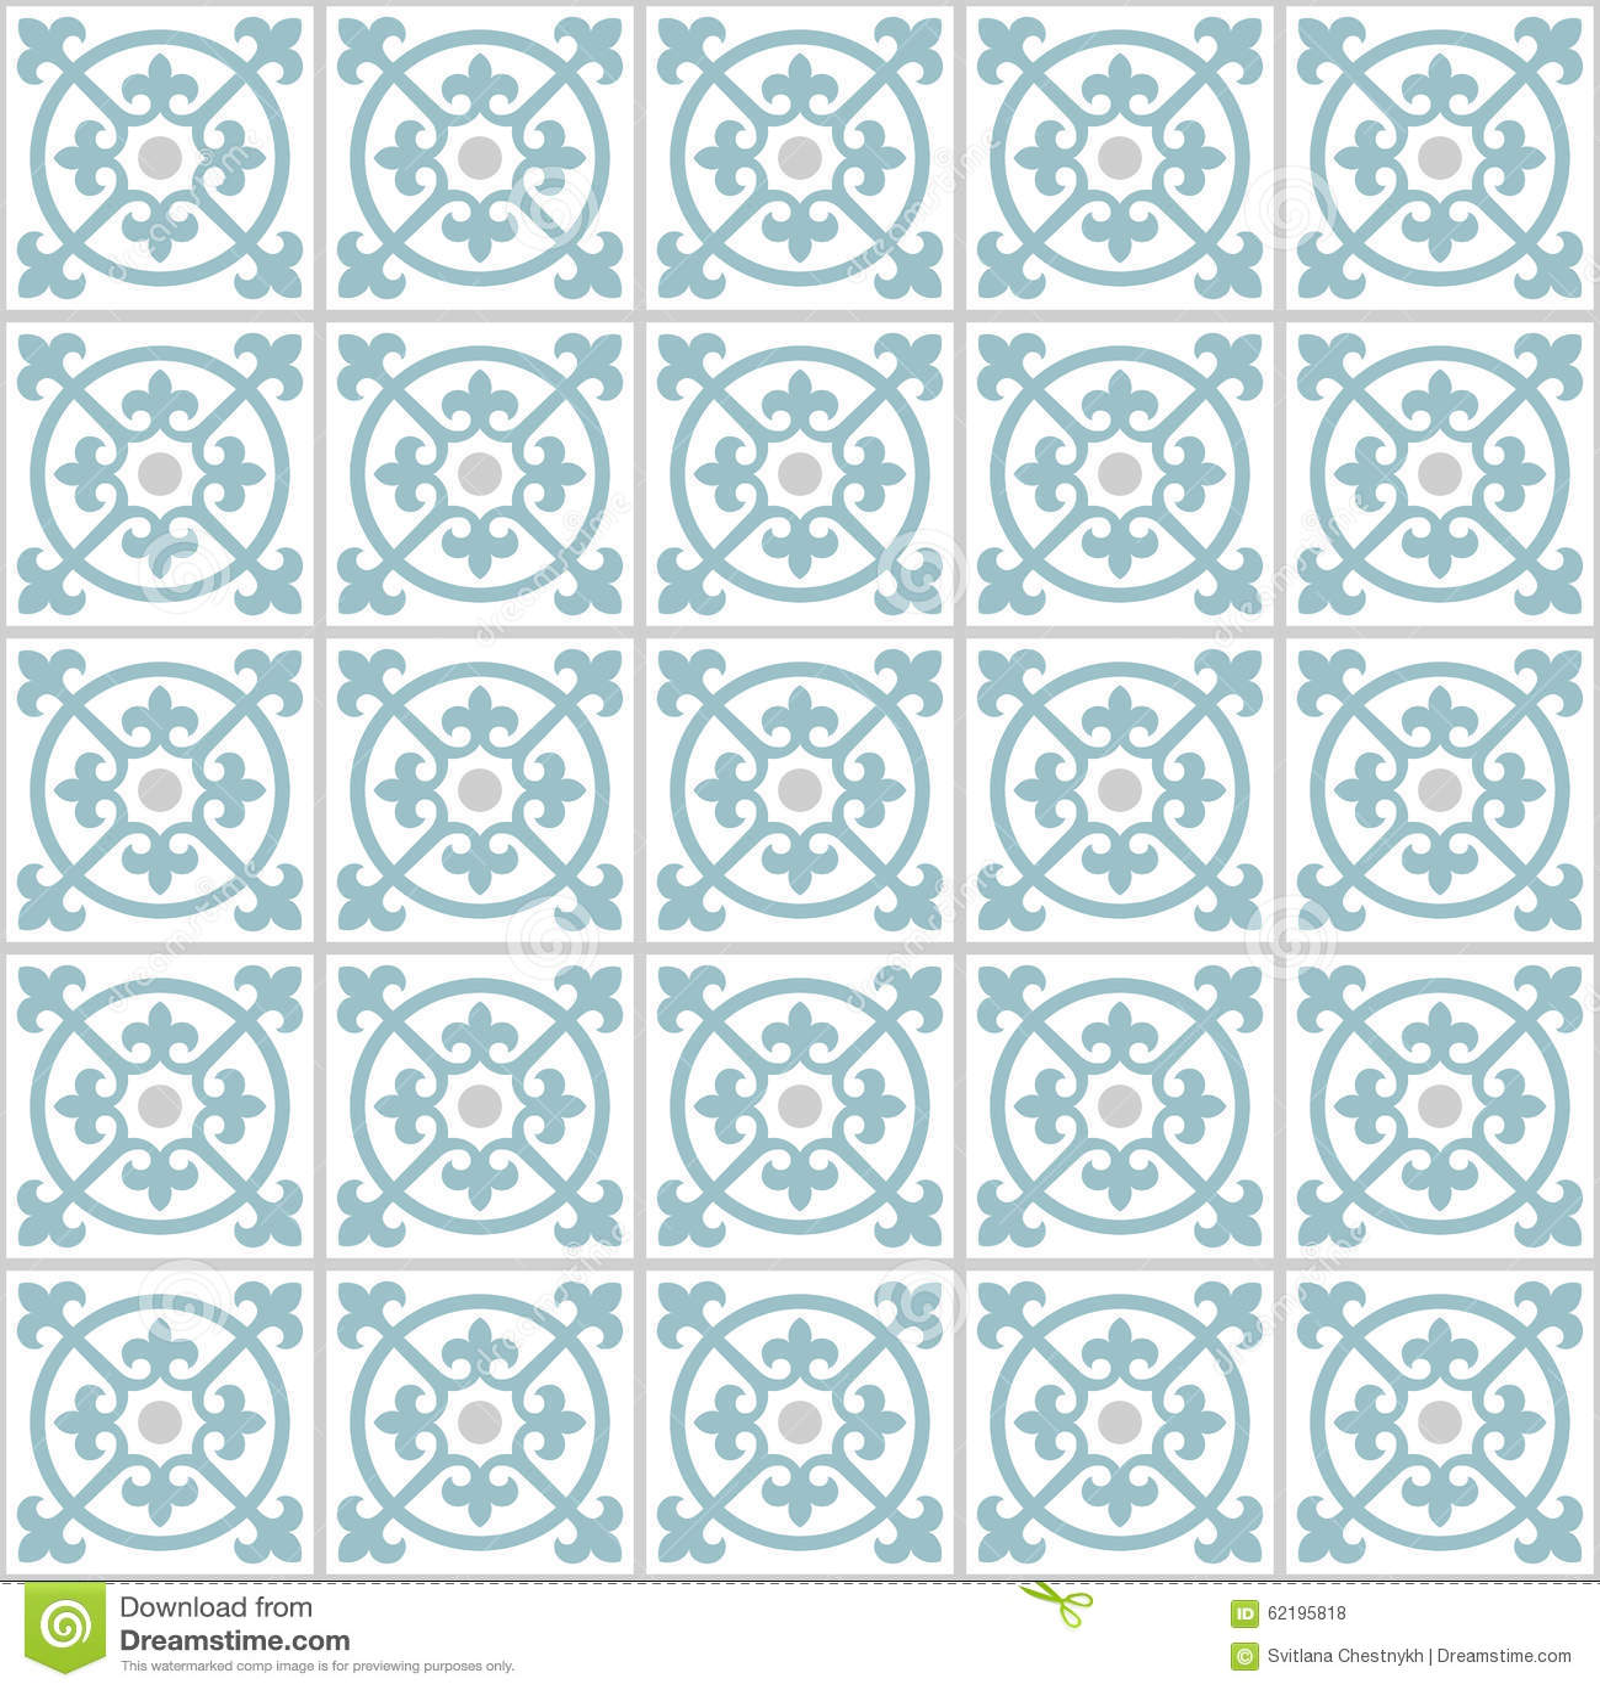 Retro Floor Tiles pattern stock vector. Illustration of floor - 62195818